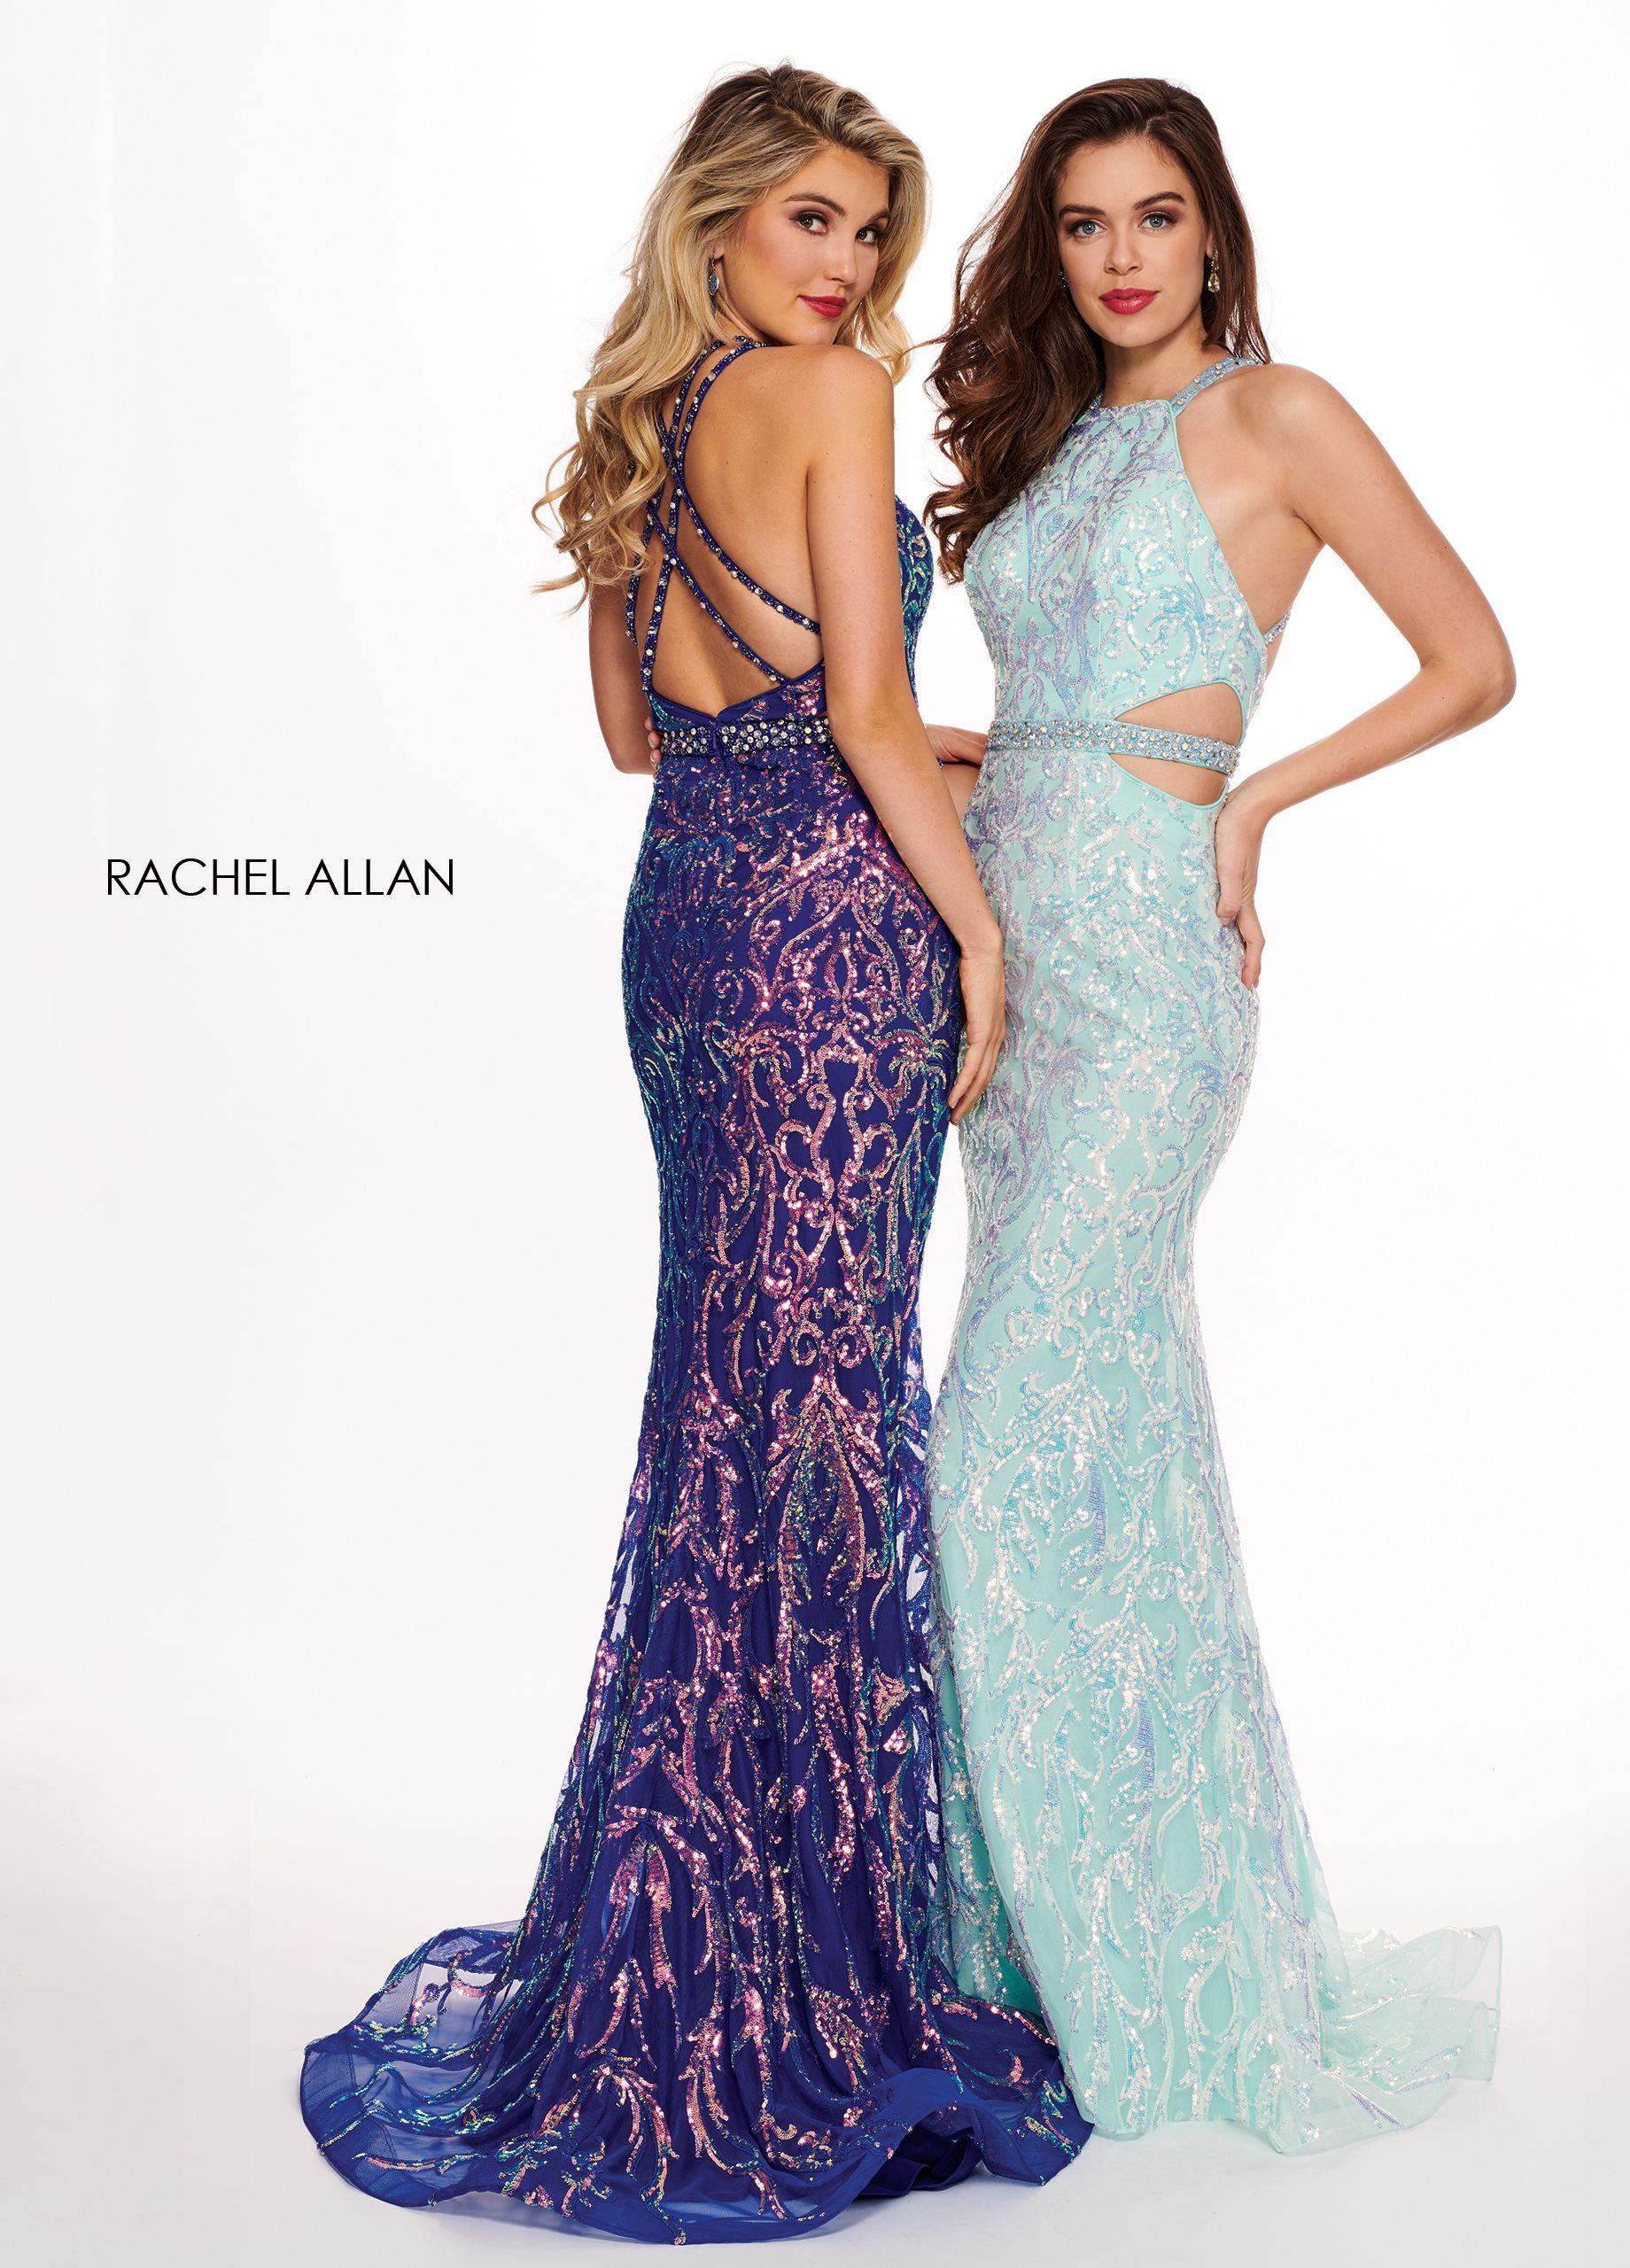 Prom Dresses Prom Dresses Style 6620 Rachel Allan Aqua And Blue Prom Dress Www Bellasalabama Com Prom Dresses Prom Dresses Prom Dresses Blue Dresses [ 2560 x 1840 Pixel ]